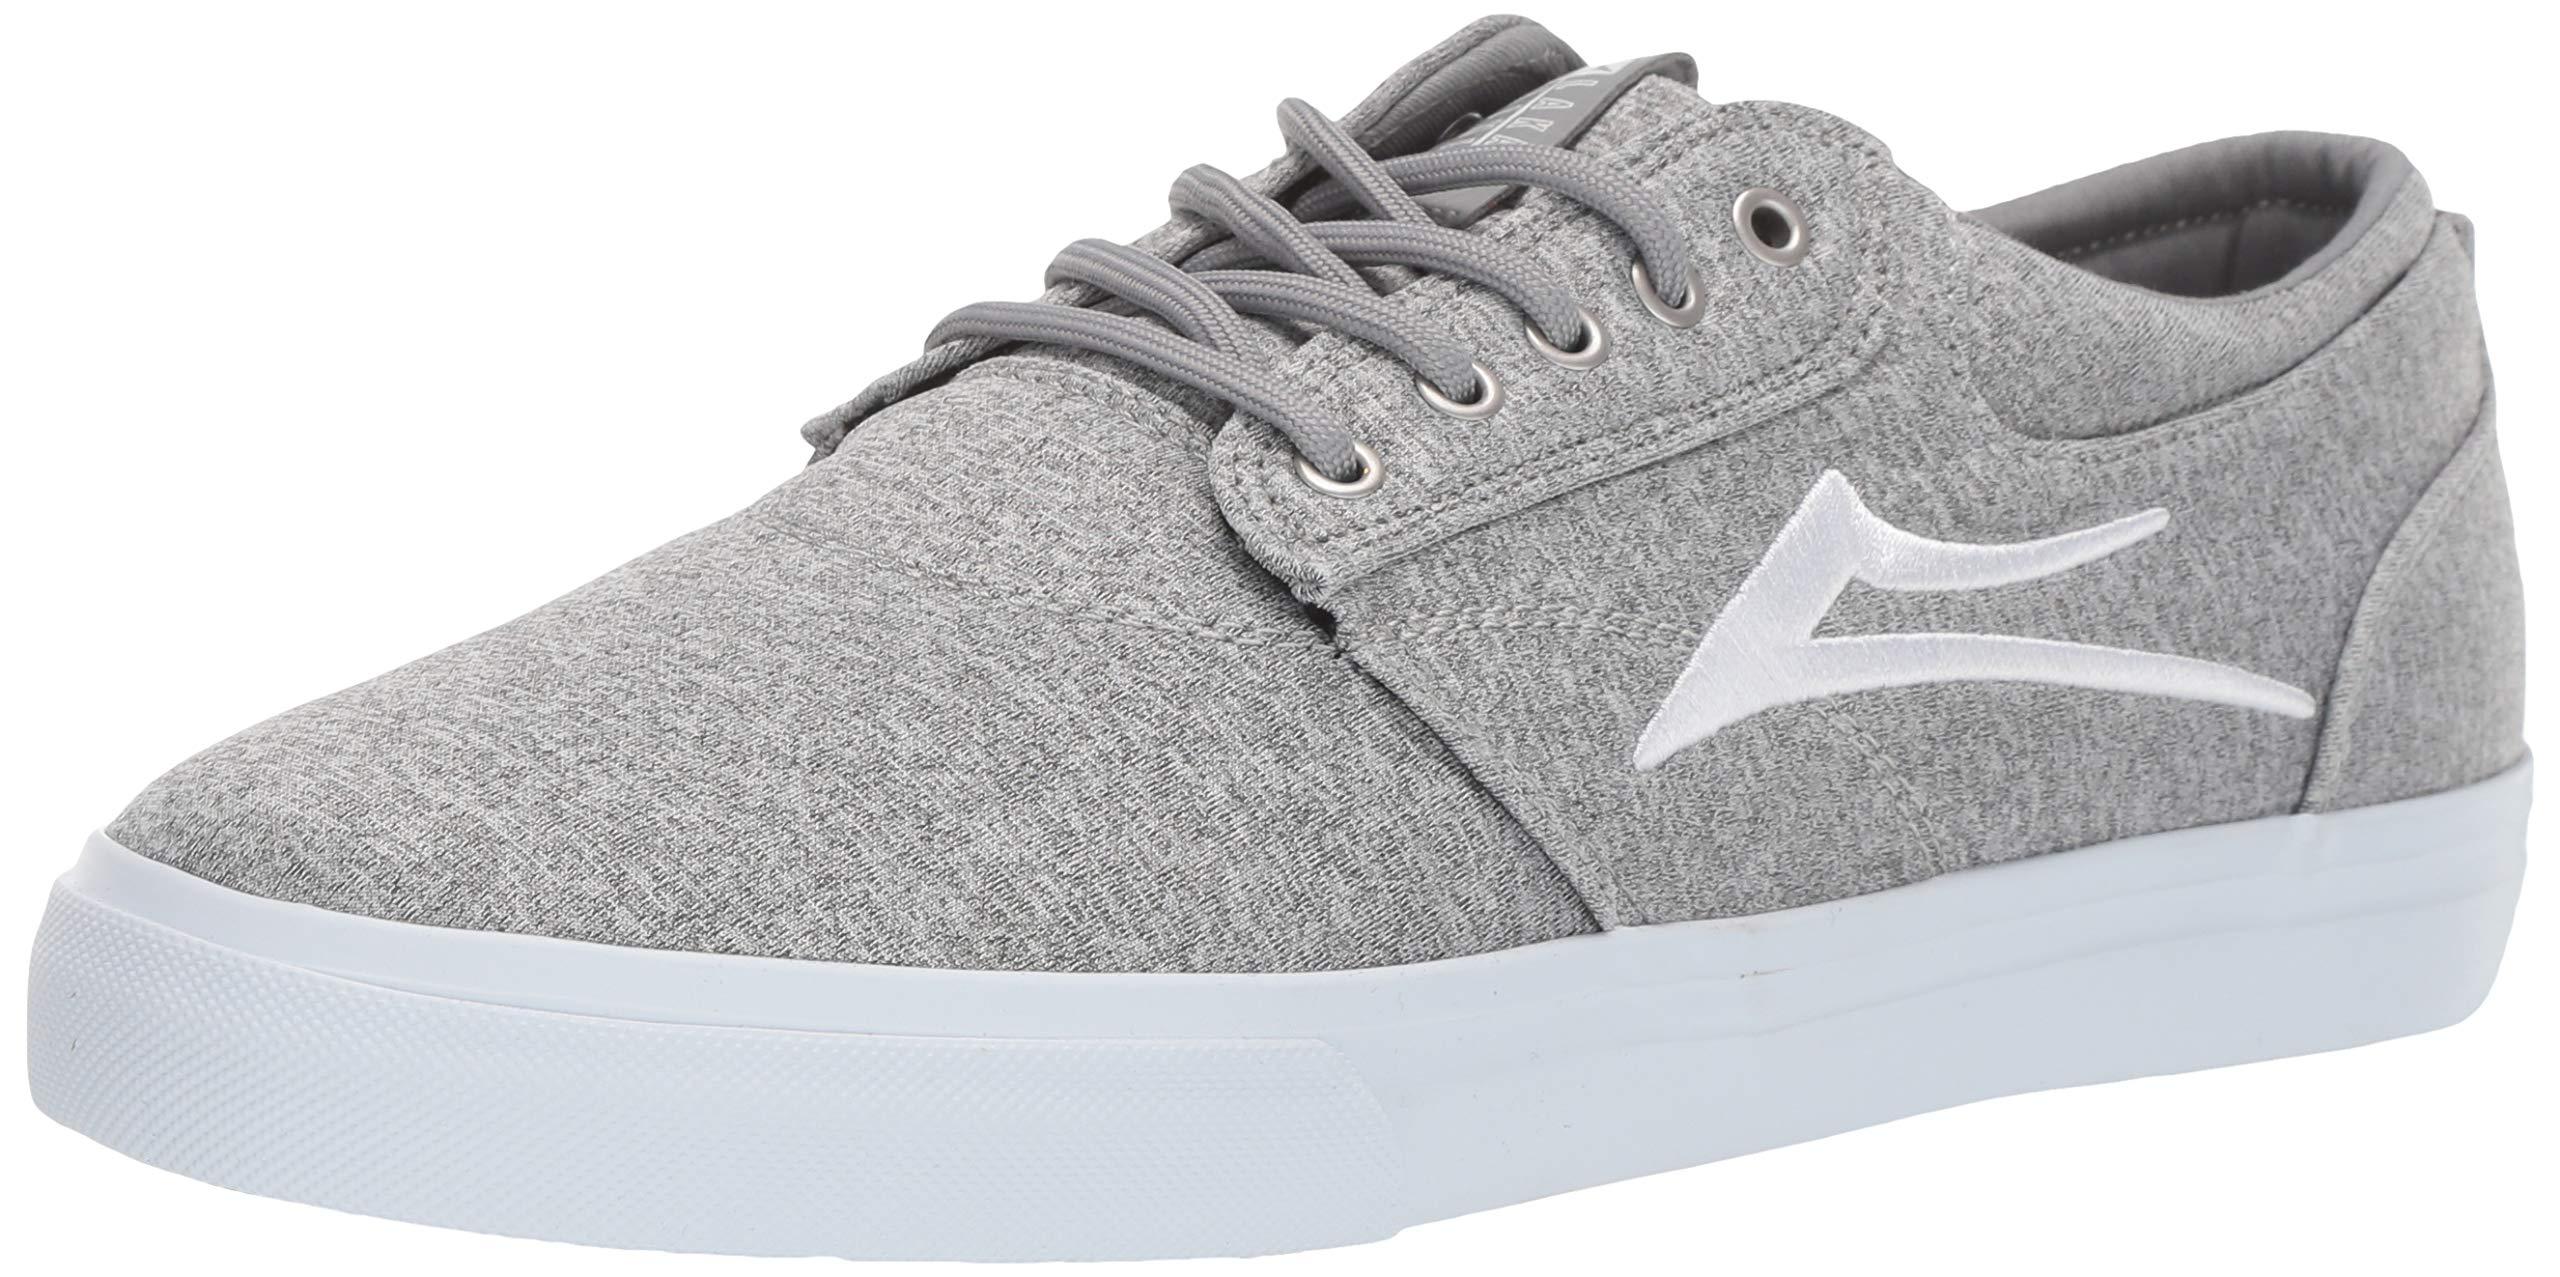 Lakai Limited Footwear Mens Griffin Skate Shoe Grey Textile 11 M US by Lakai Limited Footwear Mens